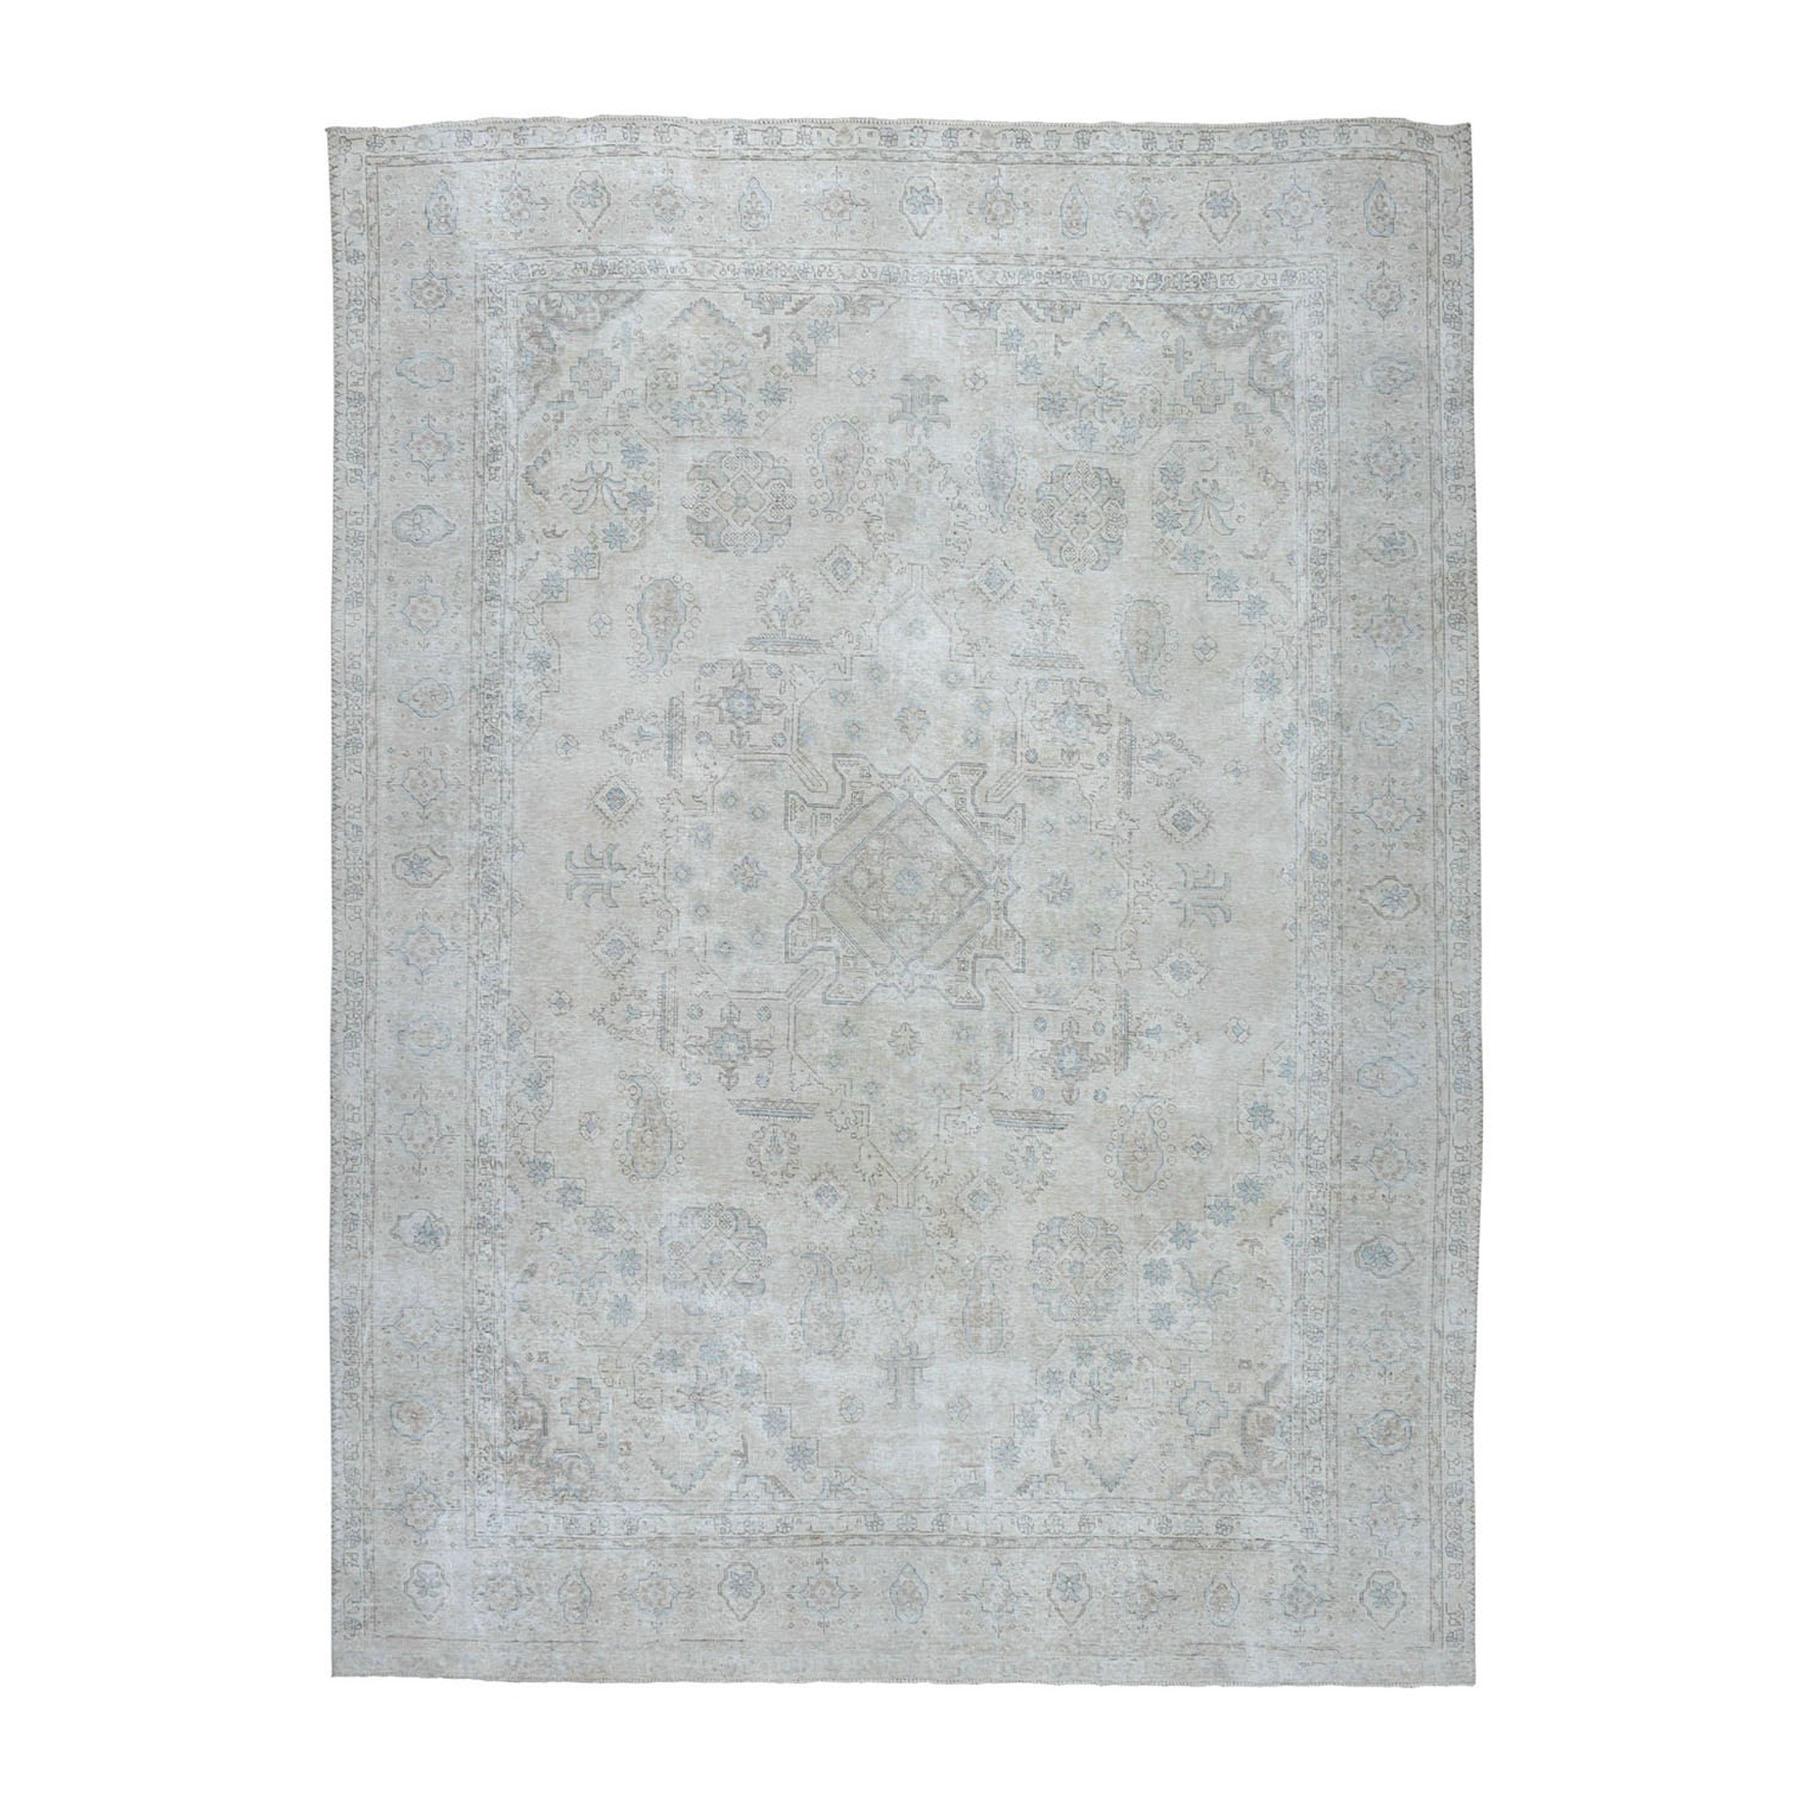 "9'8""X12' Ivory Vintage Tabriz Worn Wool Hand-Knotted Oriental Rug moae06ad"